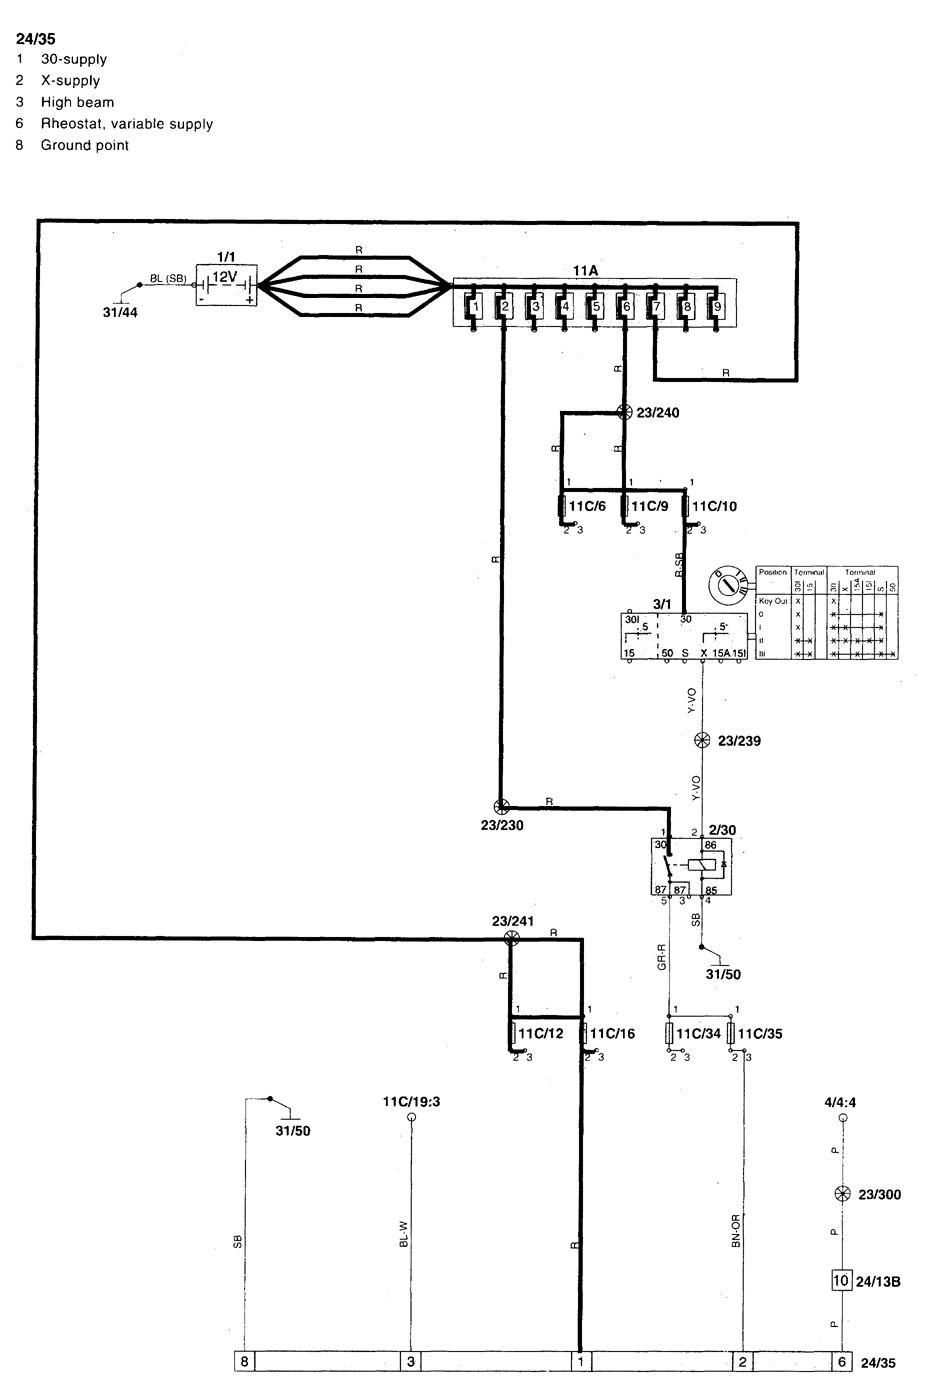 medium resolution of ignition wiring diagram for 1999 volvo s70 1999 mercury volvo s70 stereo wiring diagram 1998 volvo